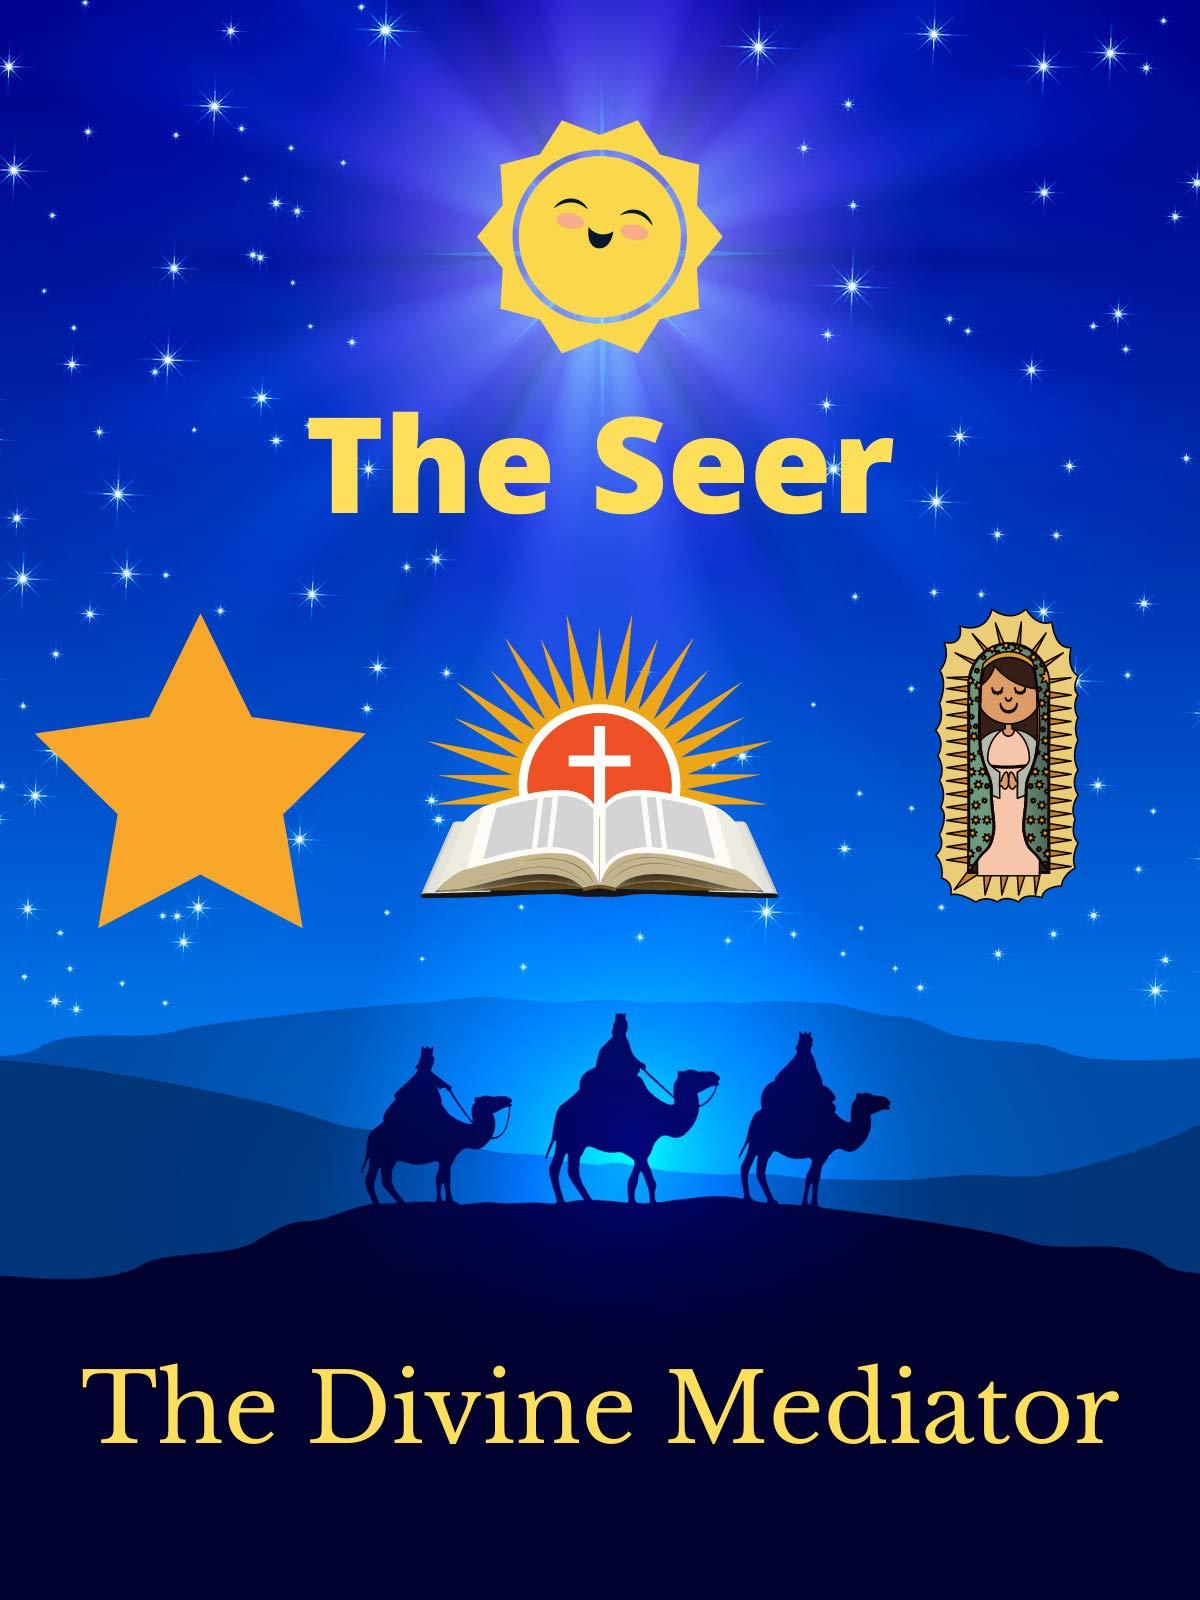 The Divine Mediator